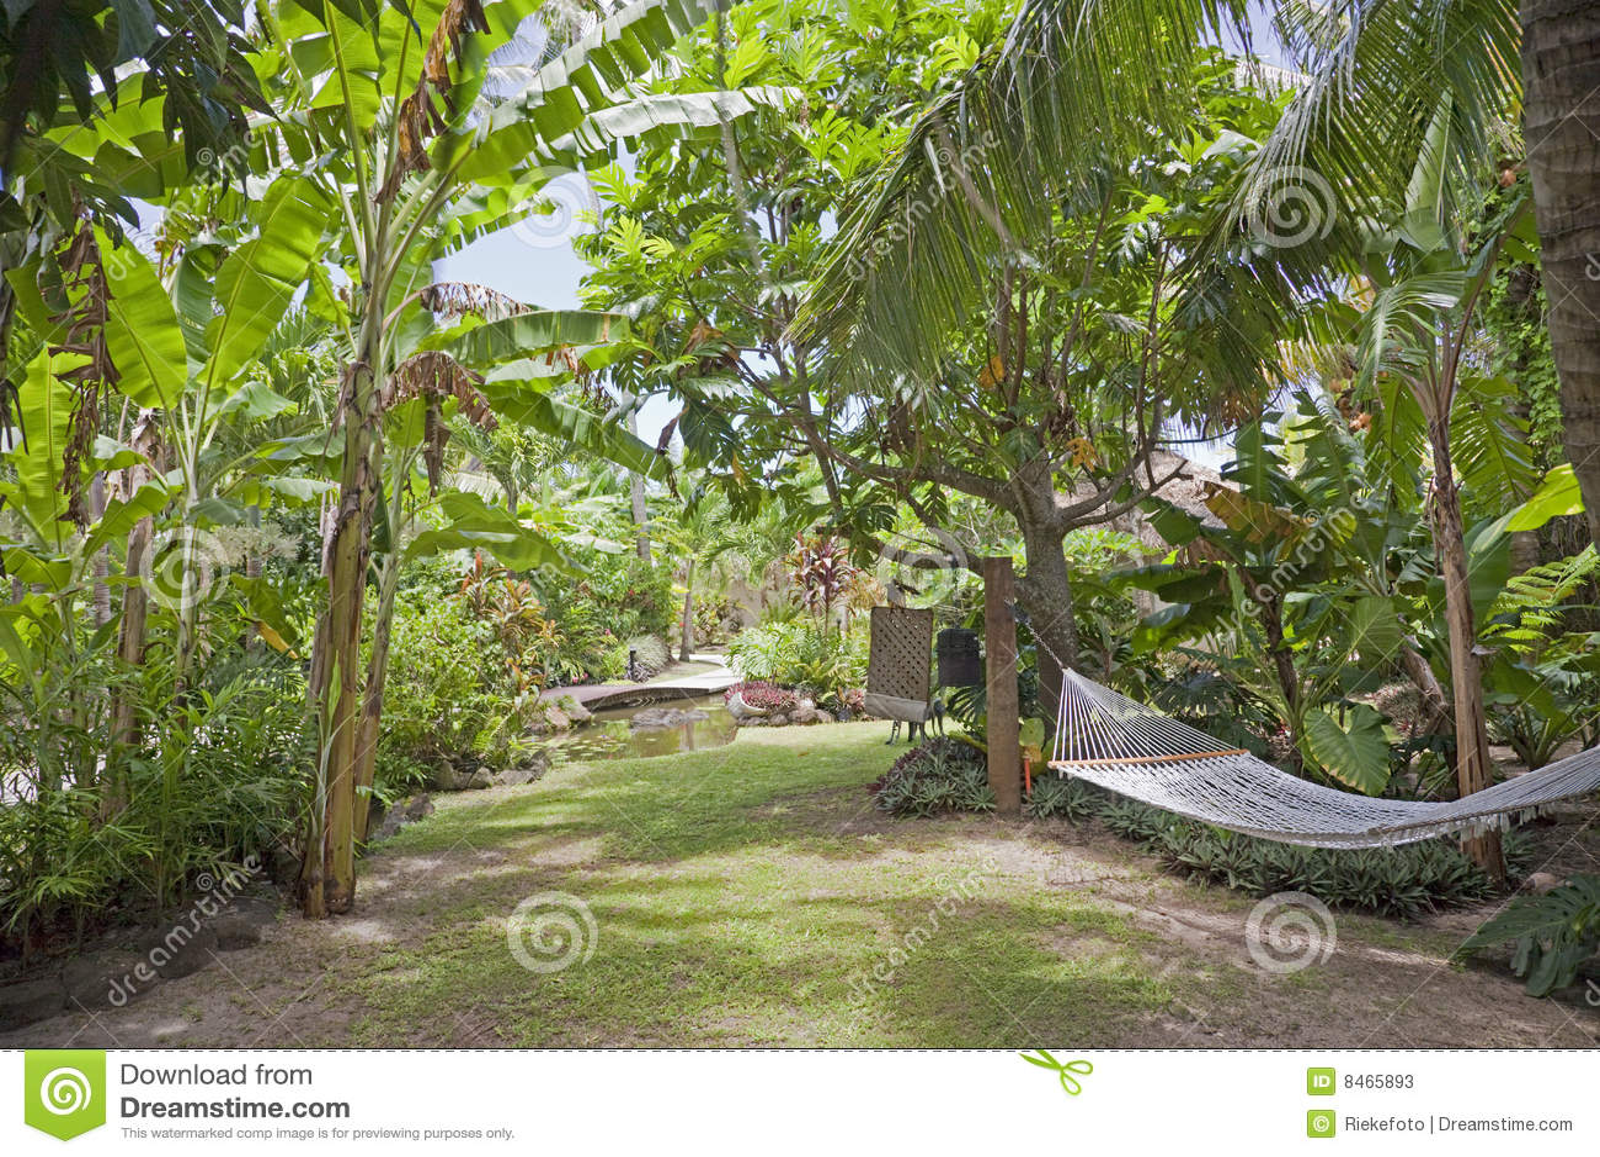 hamac de jardin tropical photos stock image 8465893. Black Bedroom Furniture Sets. Home Design Ideas